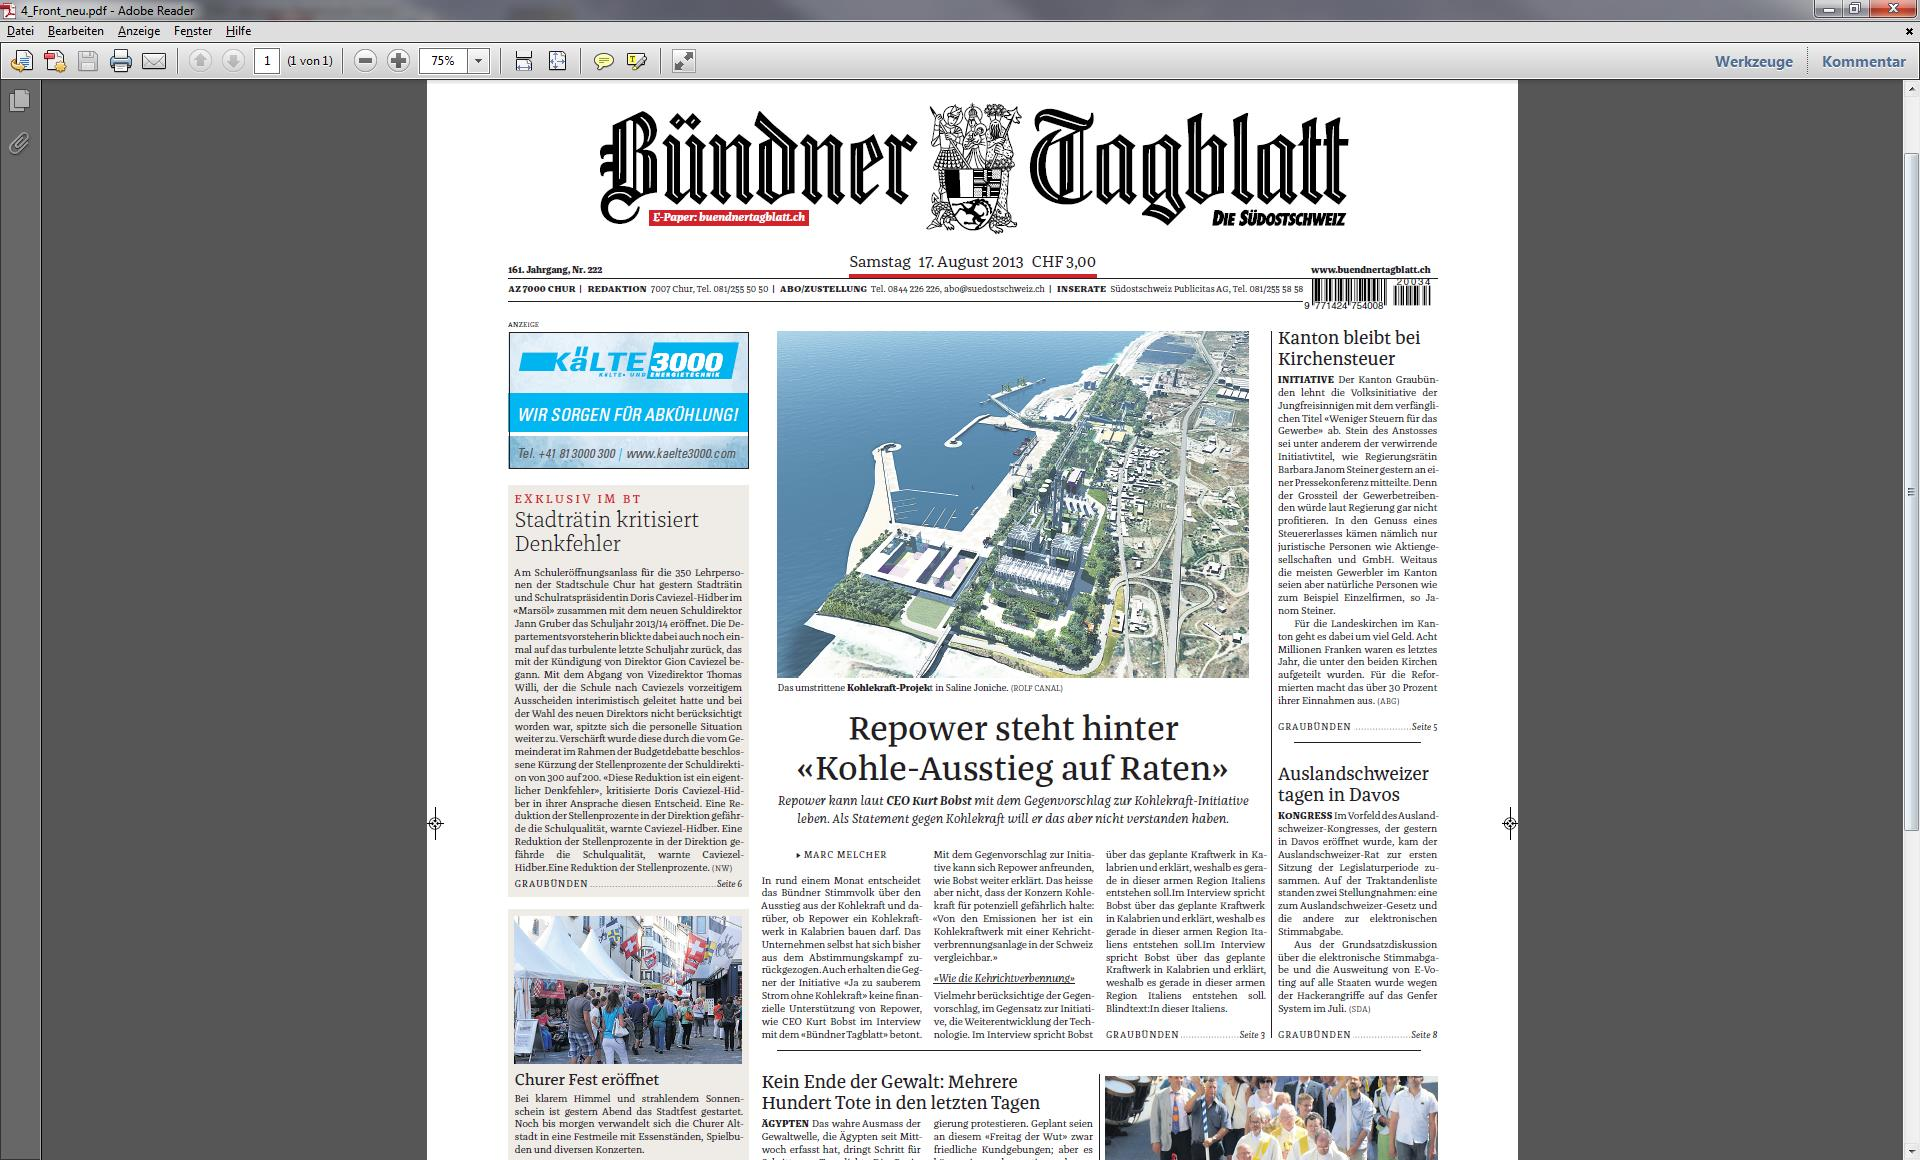 "Il nov ""Bündner Tagblatt"" cumpara a partir da sonda, 31-08-2013."